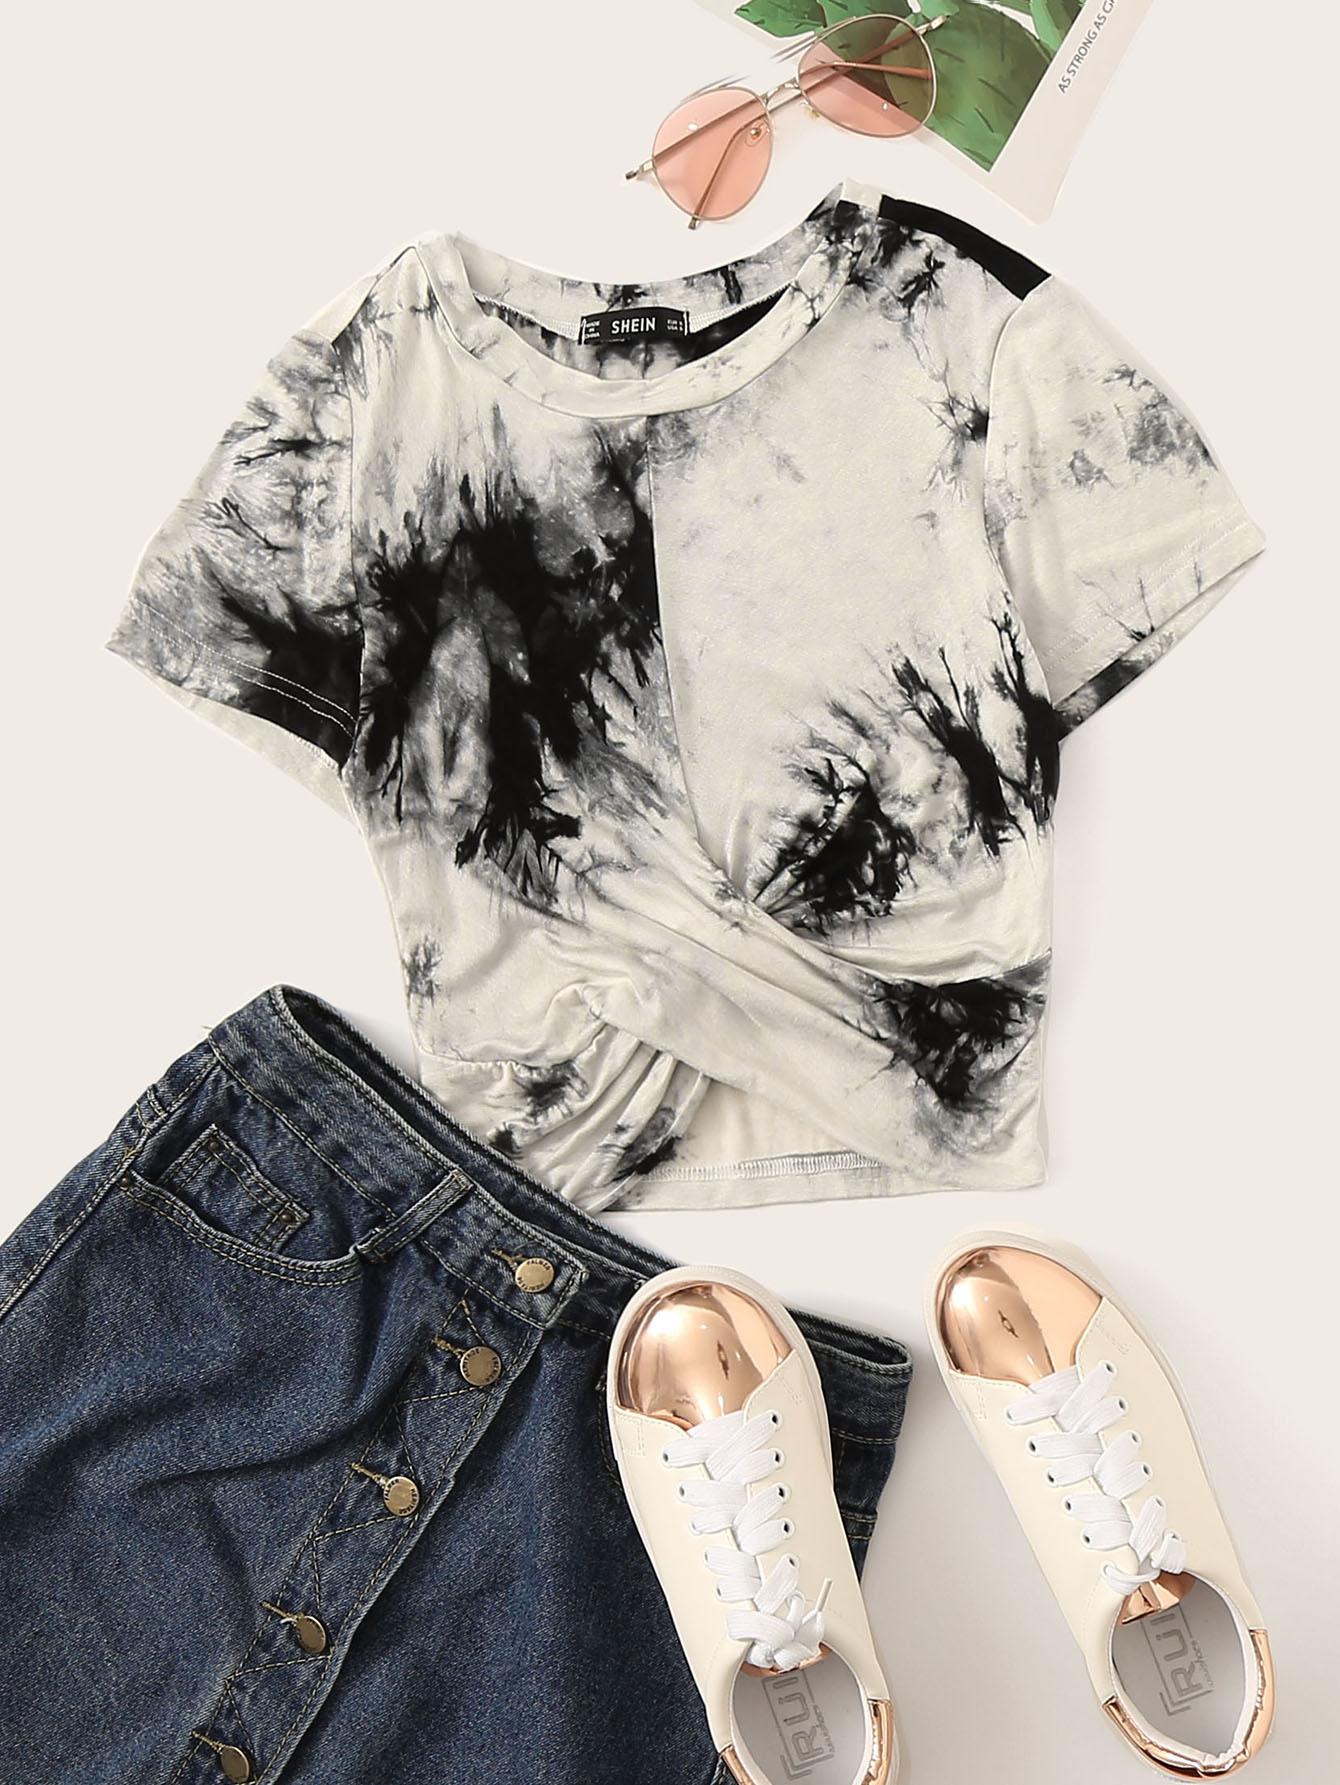 Фото - Короткая футболка на запах с принтом от SheIn цвет чёрнобелые